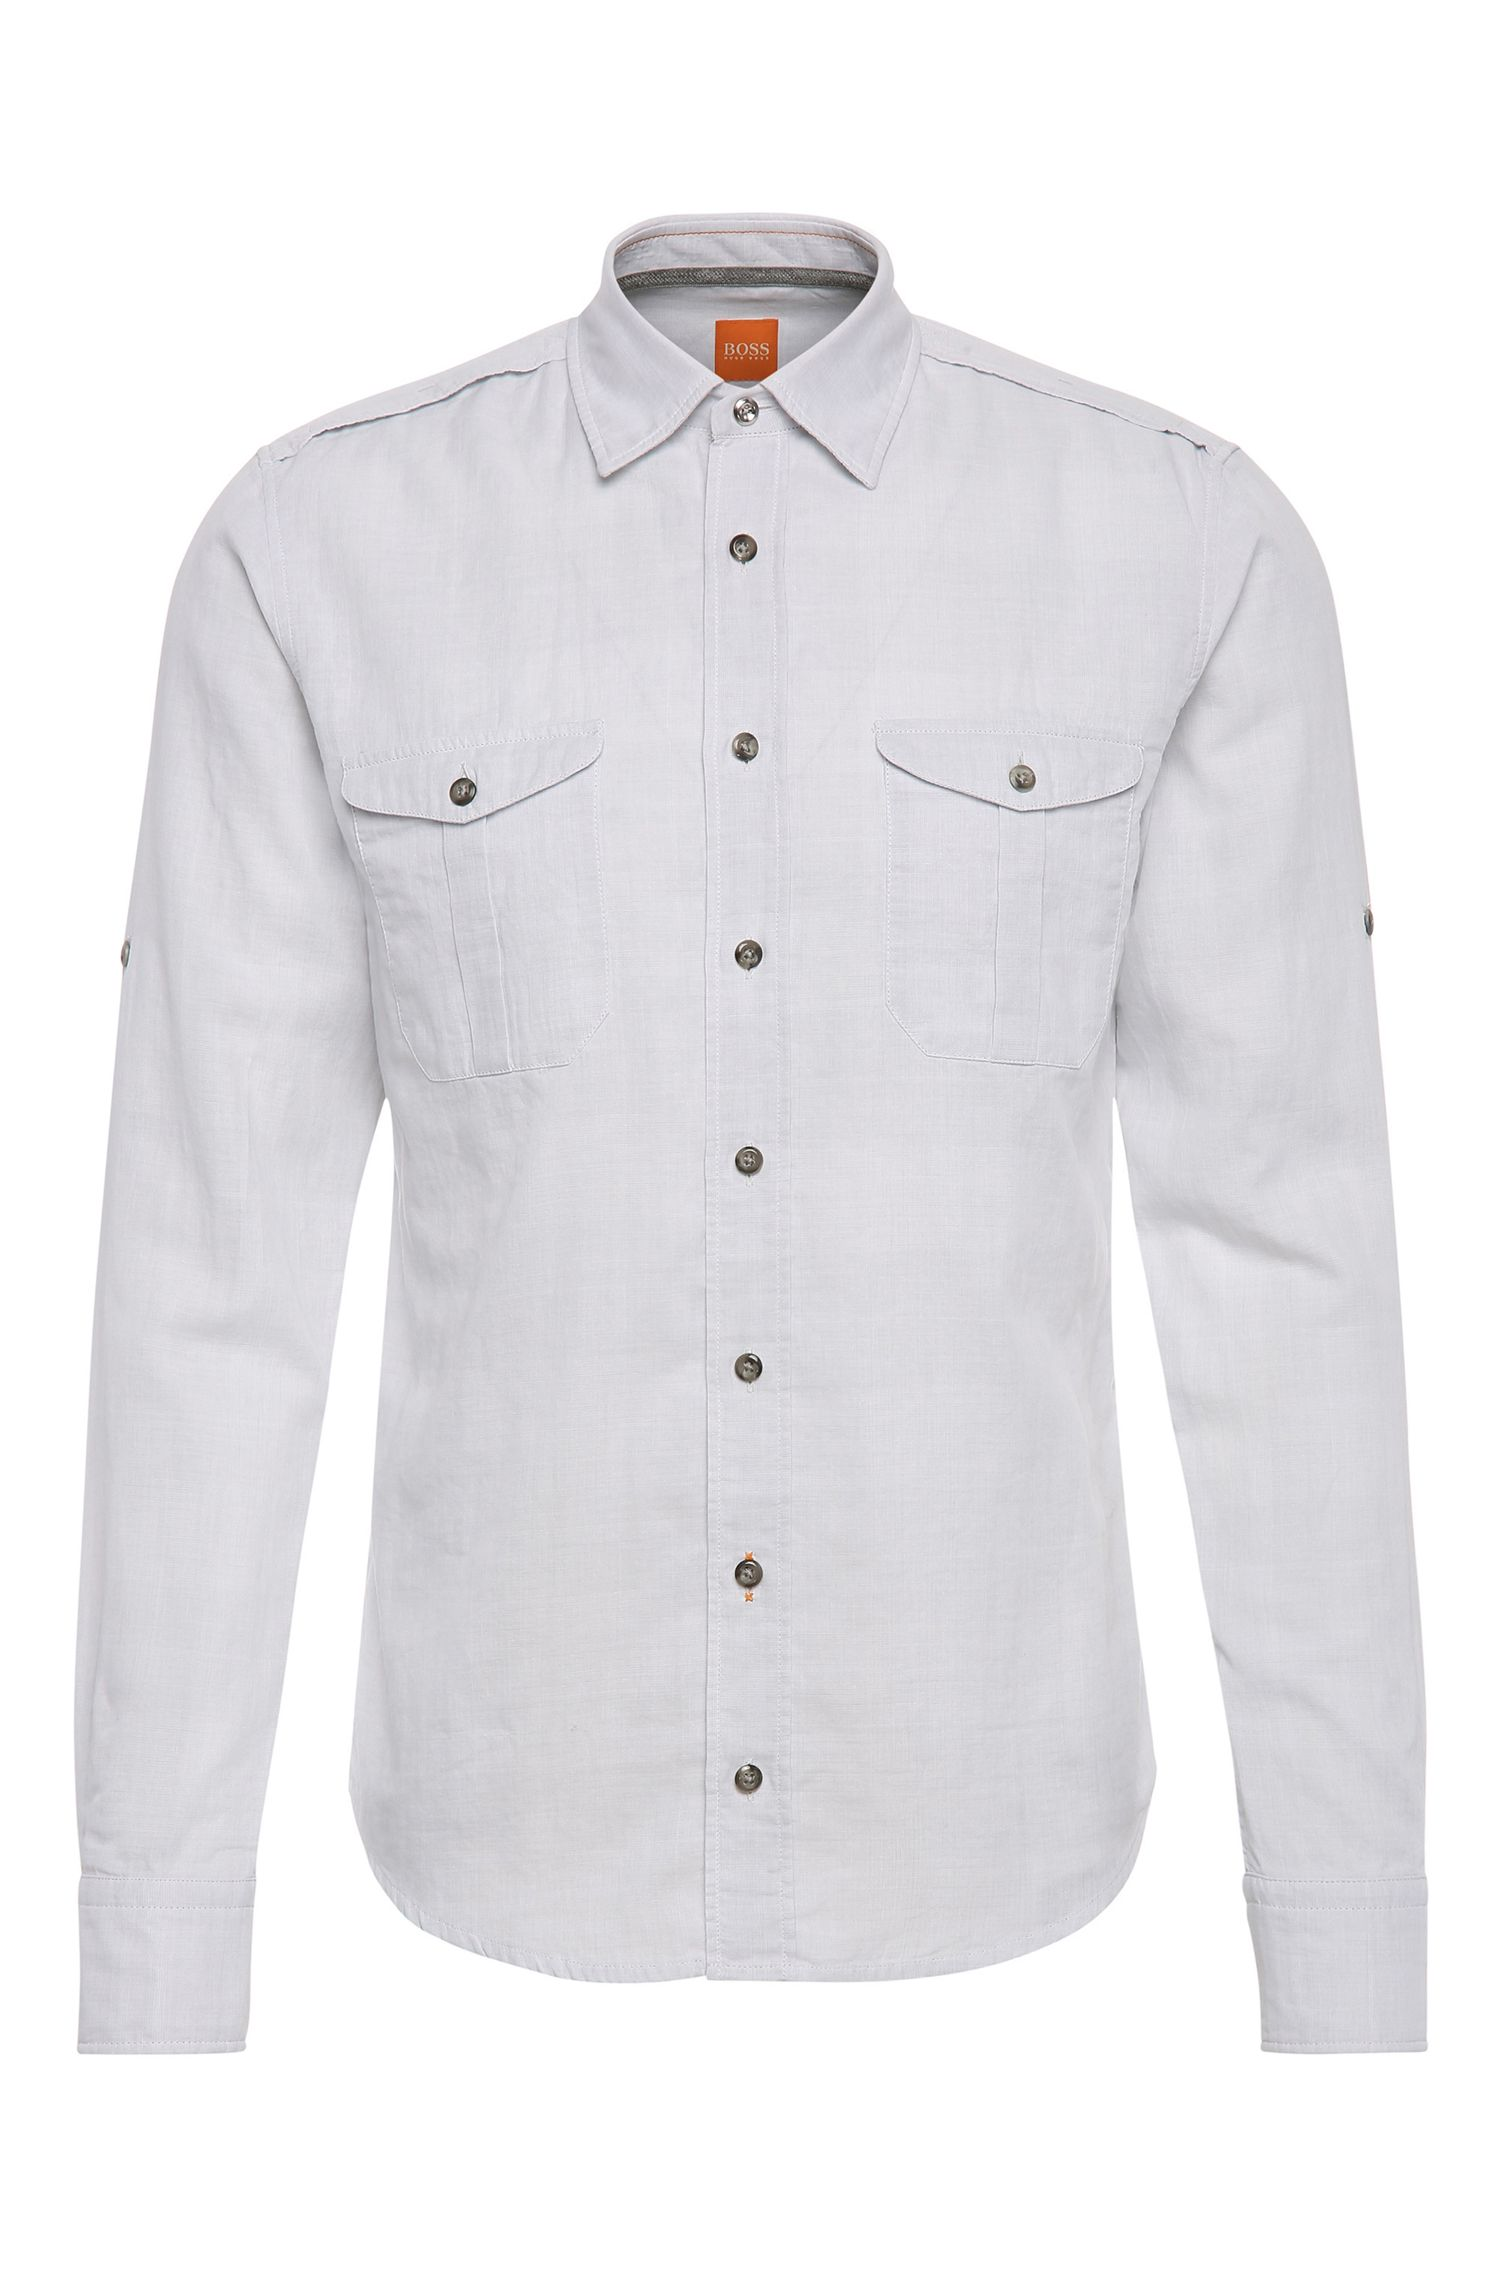 Slim-fit shirt in textured cotton: 'CadettoE'